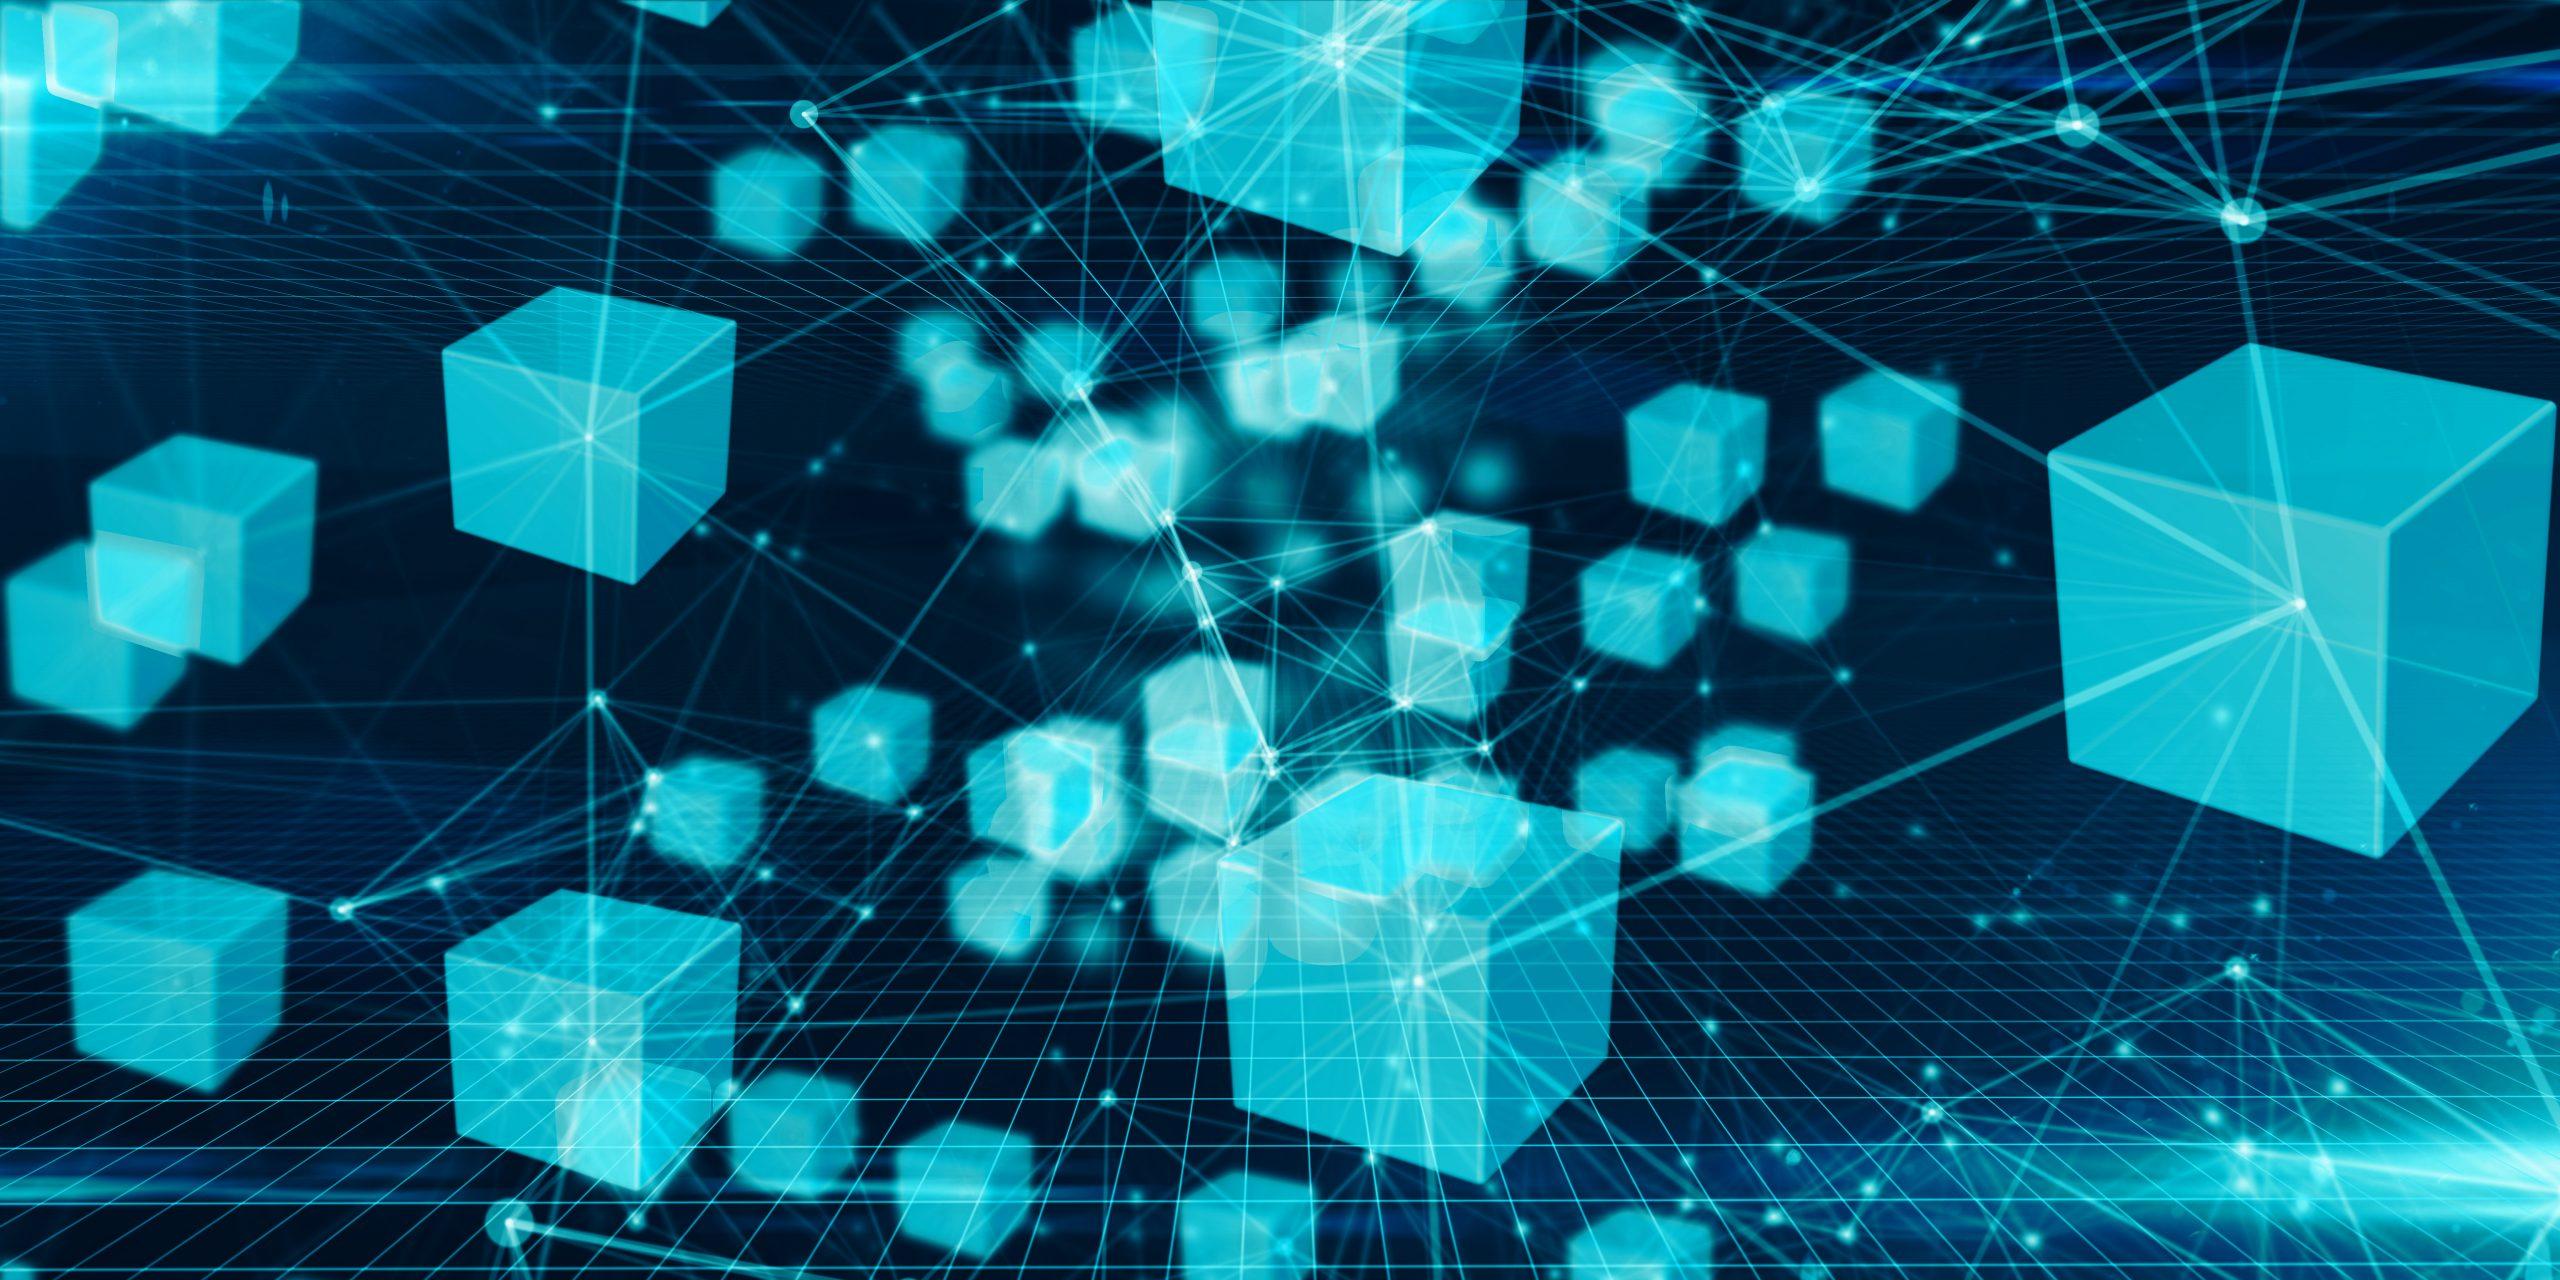 Blockchain,Encryption,For,Crypto,Currencies,Bitcoin,Financial,Iot,Cloud,Computing